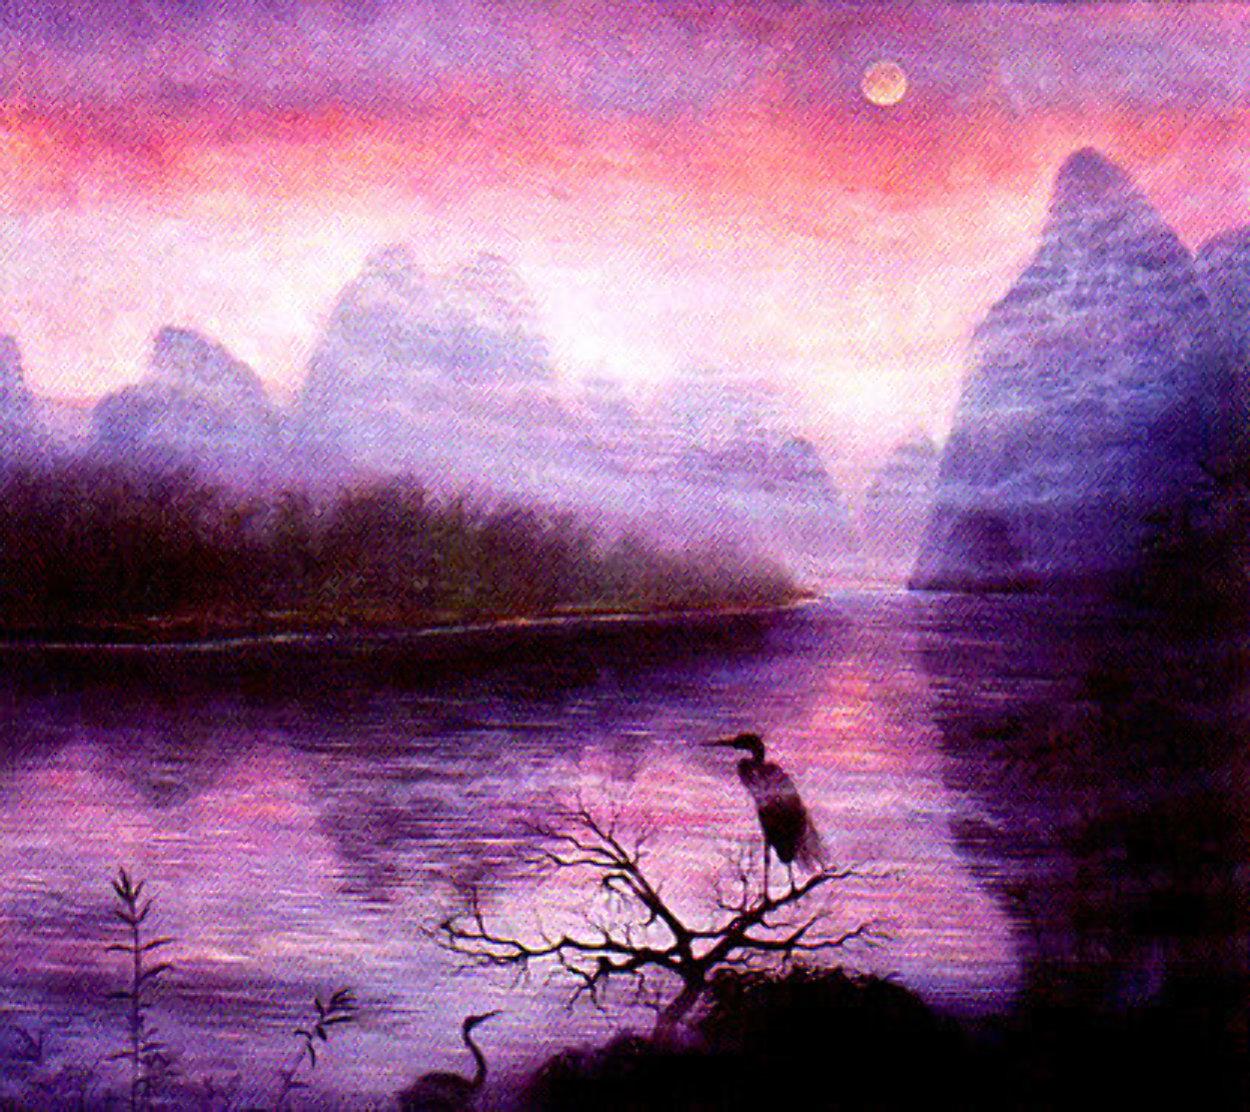 Hidden Valley 1984 Limited Edition Print by Brett Livingstone Strong